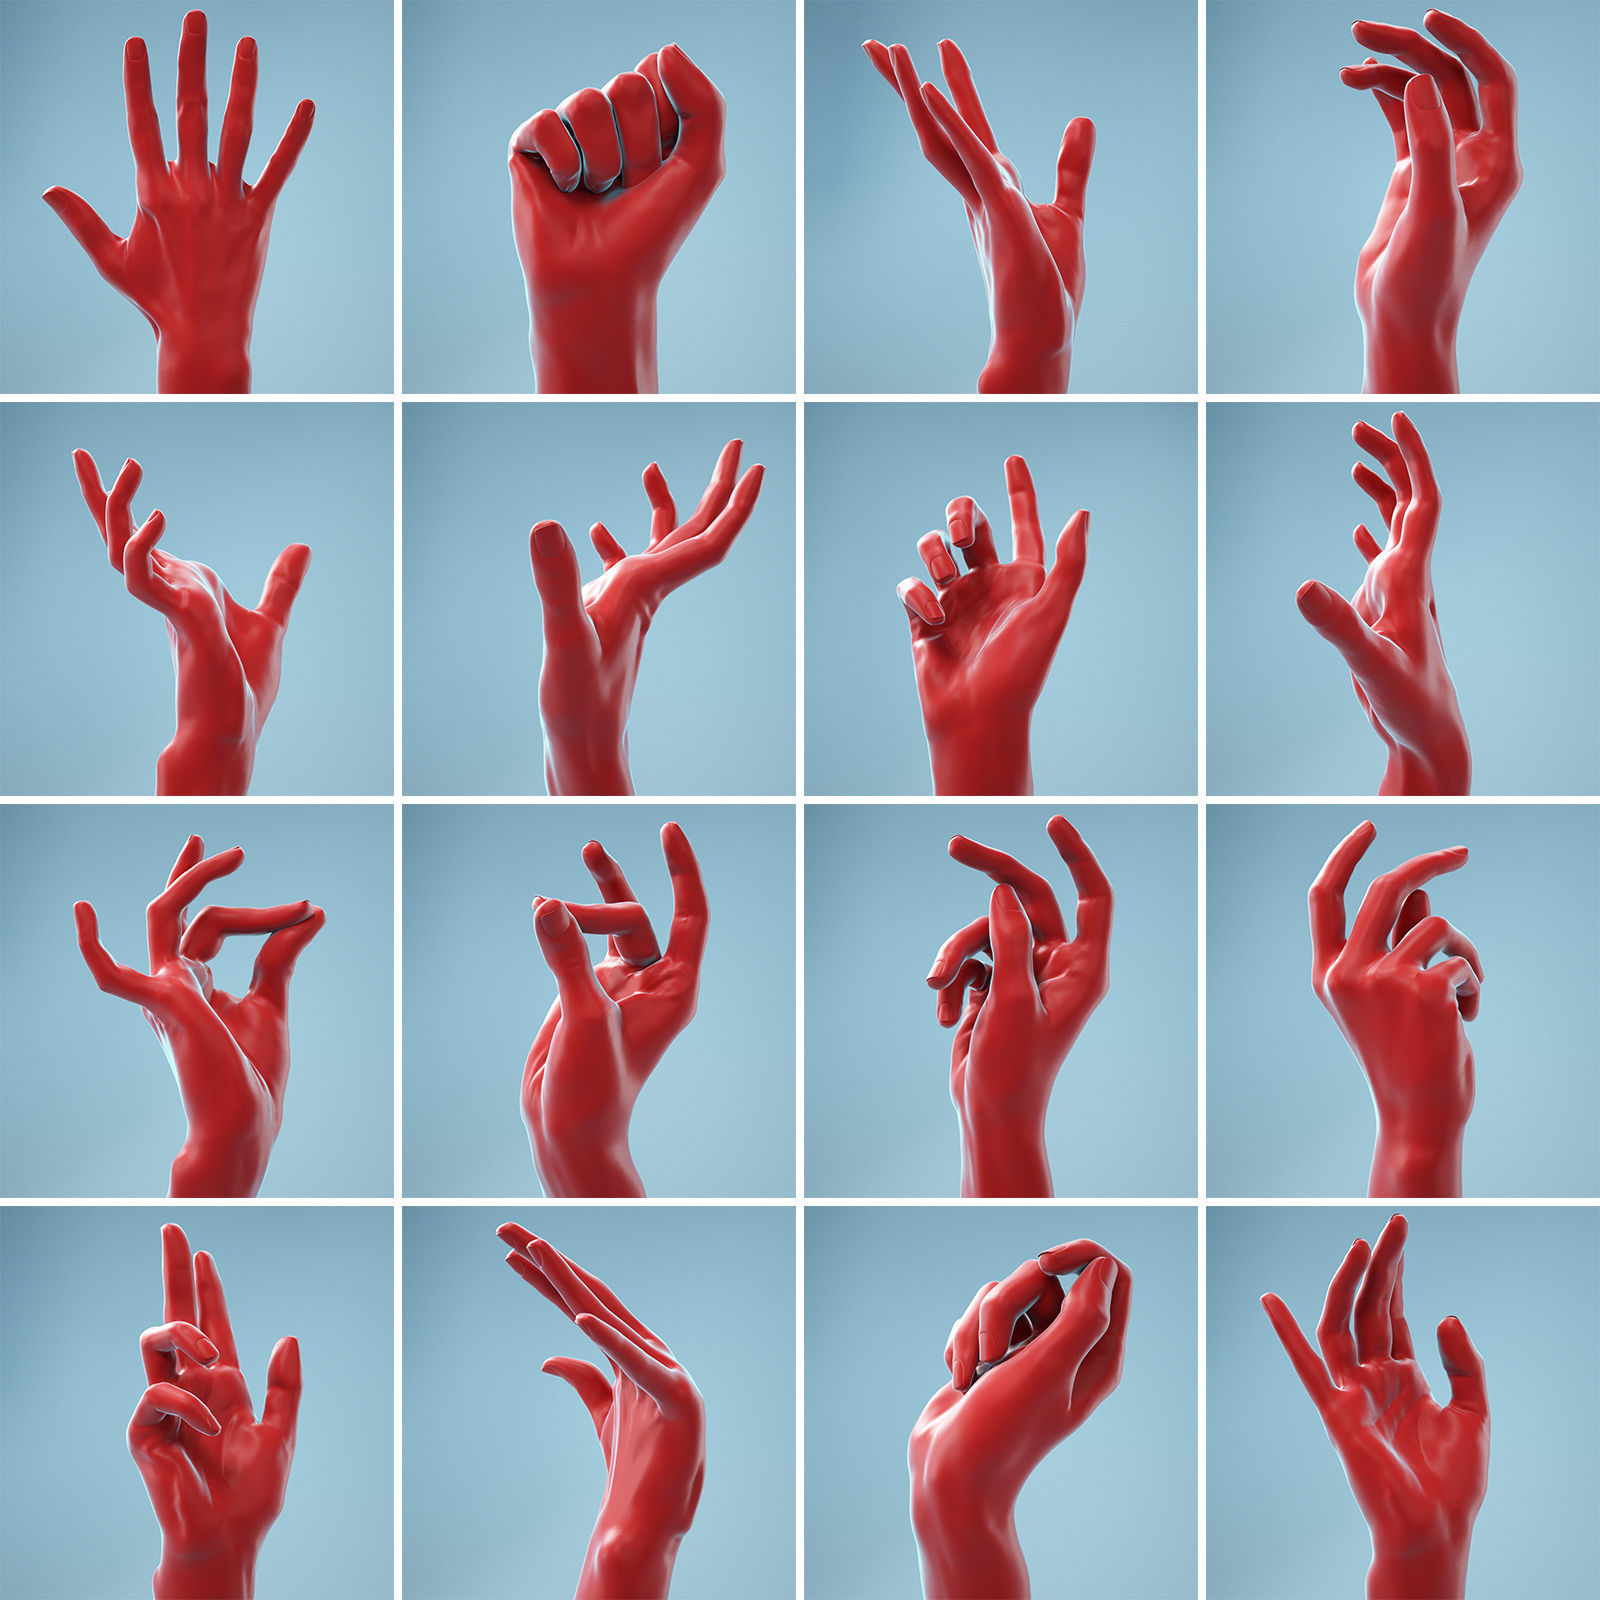 13 Female Hands Posed